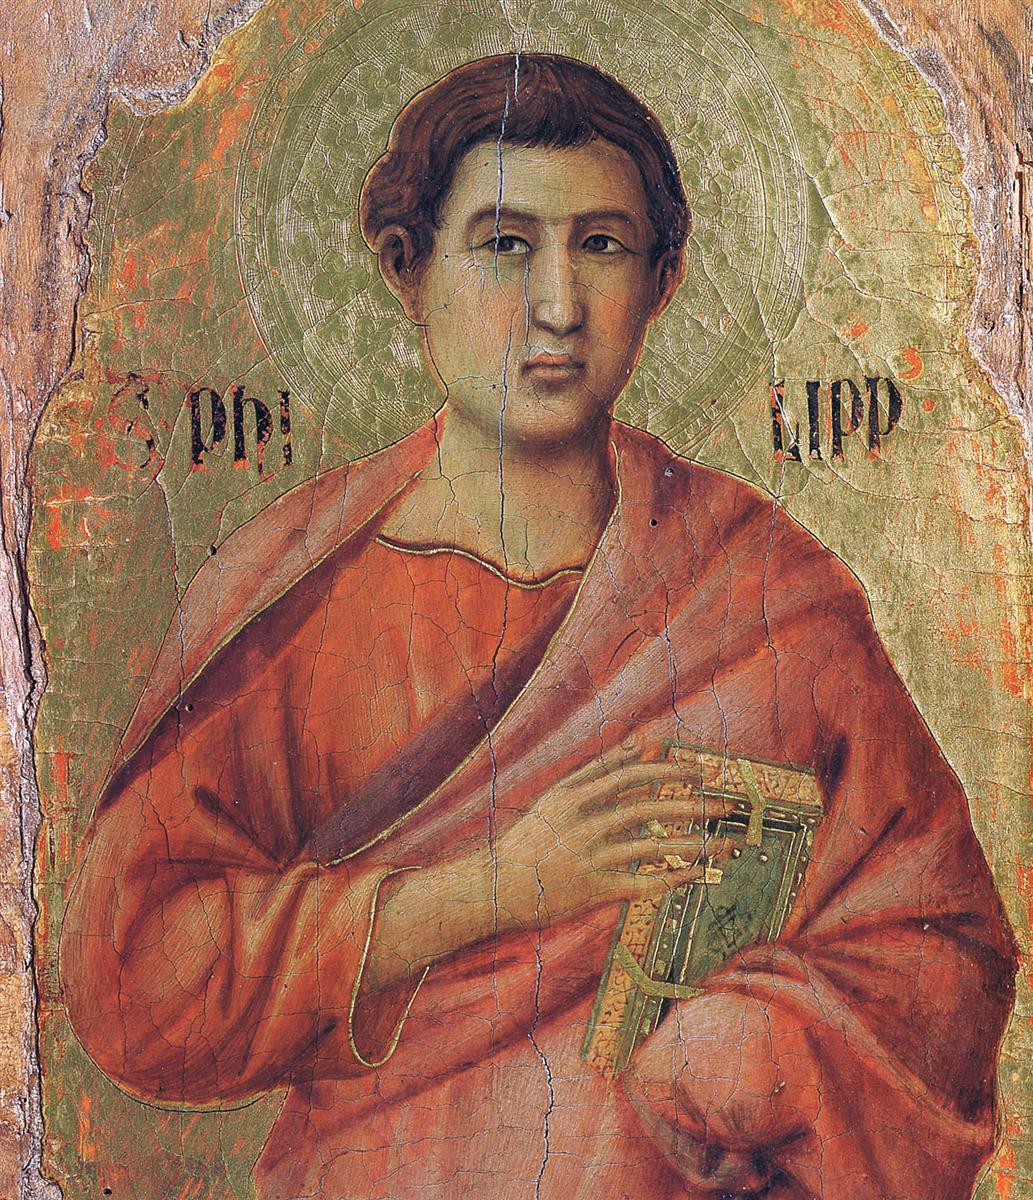 apostle-philip-1311.jpg!HD.jpg